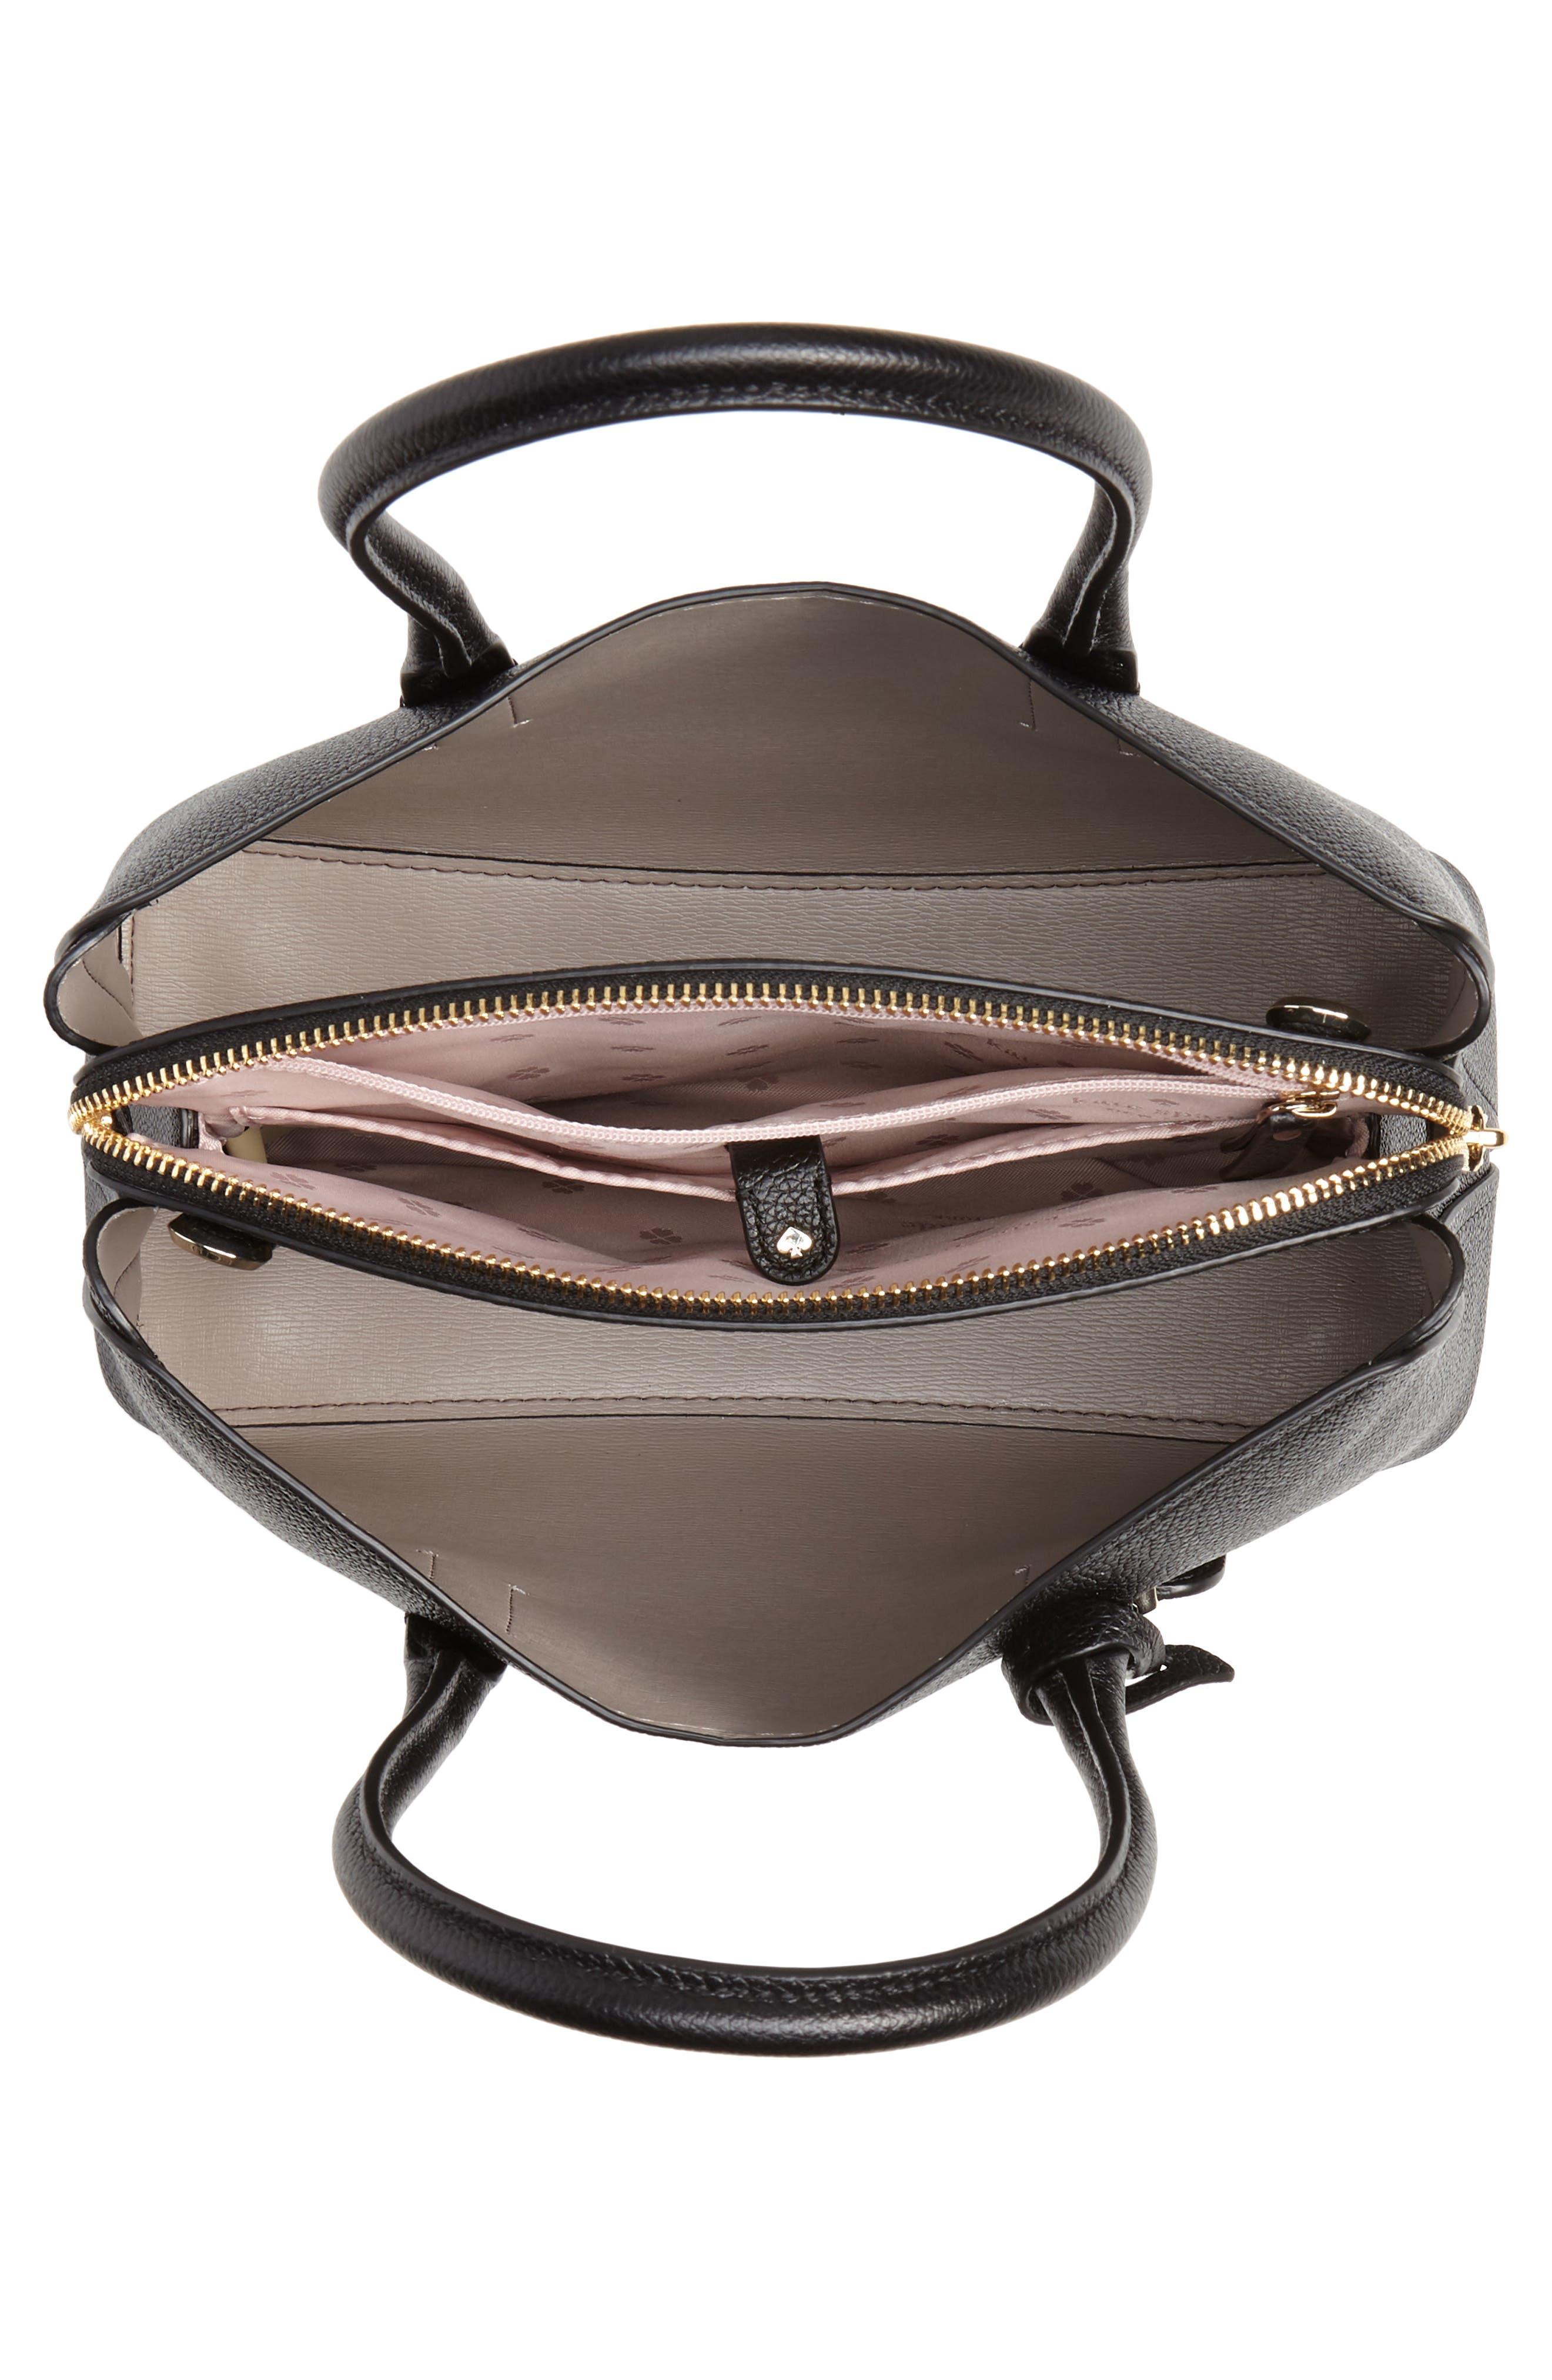 KATE SPADE NEW YORK, medium margaux leather satchel, Alternate thumbnail 5, color, BLACK